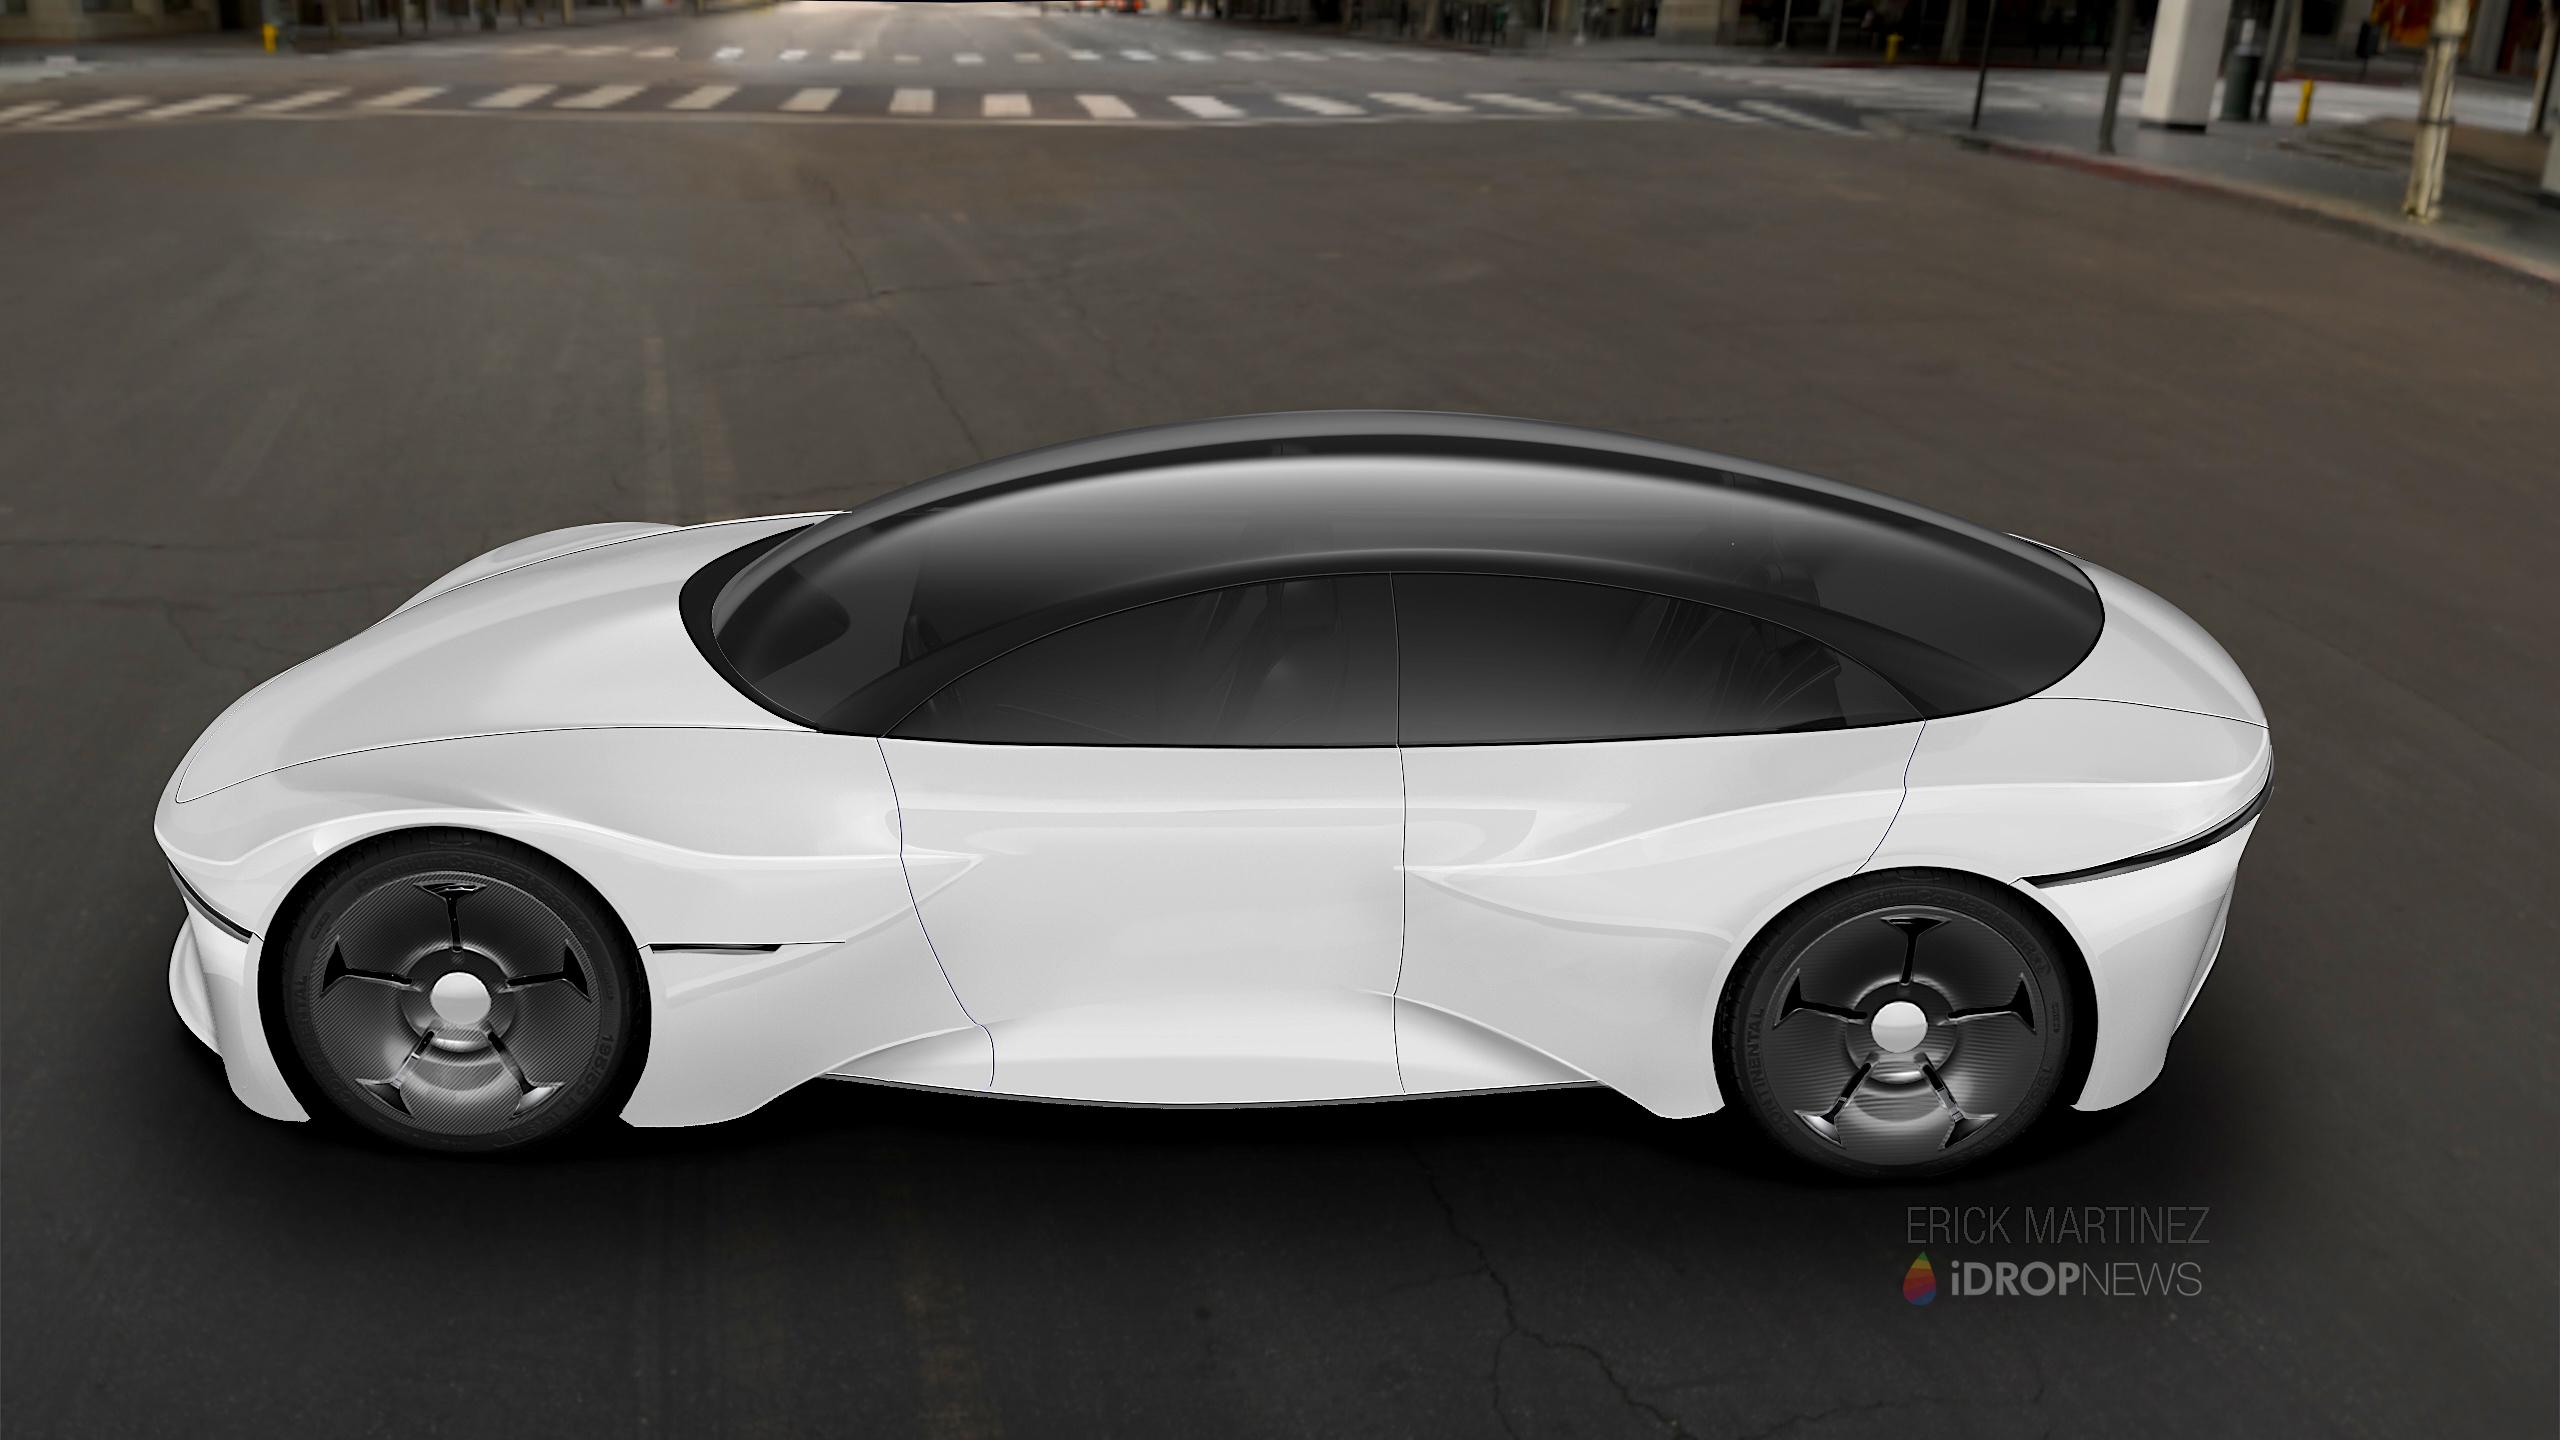 apple-car-concept-renders-idrop-news-4